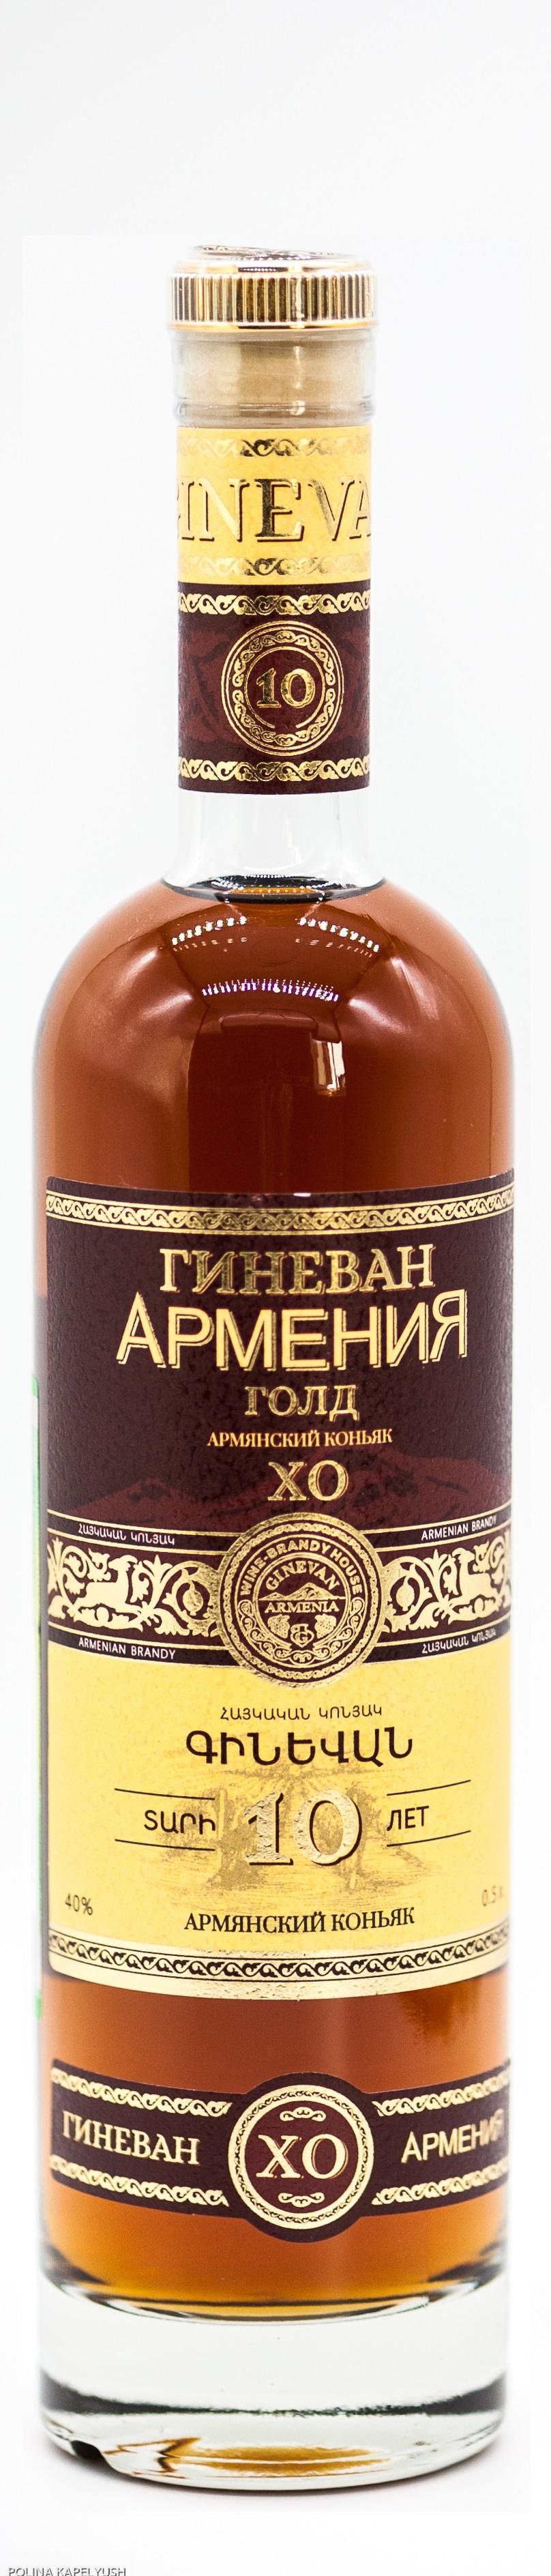 Гиневан Армения Голд 10 лет 0,5 л.